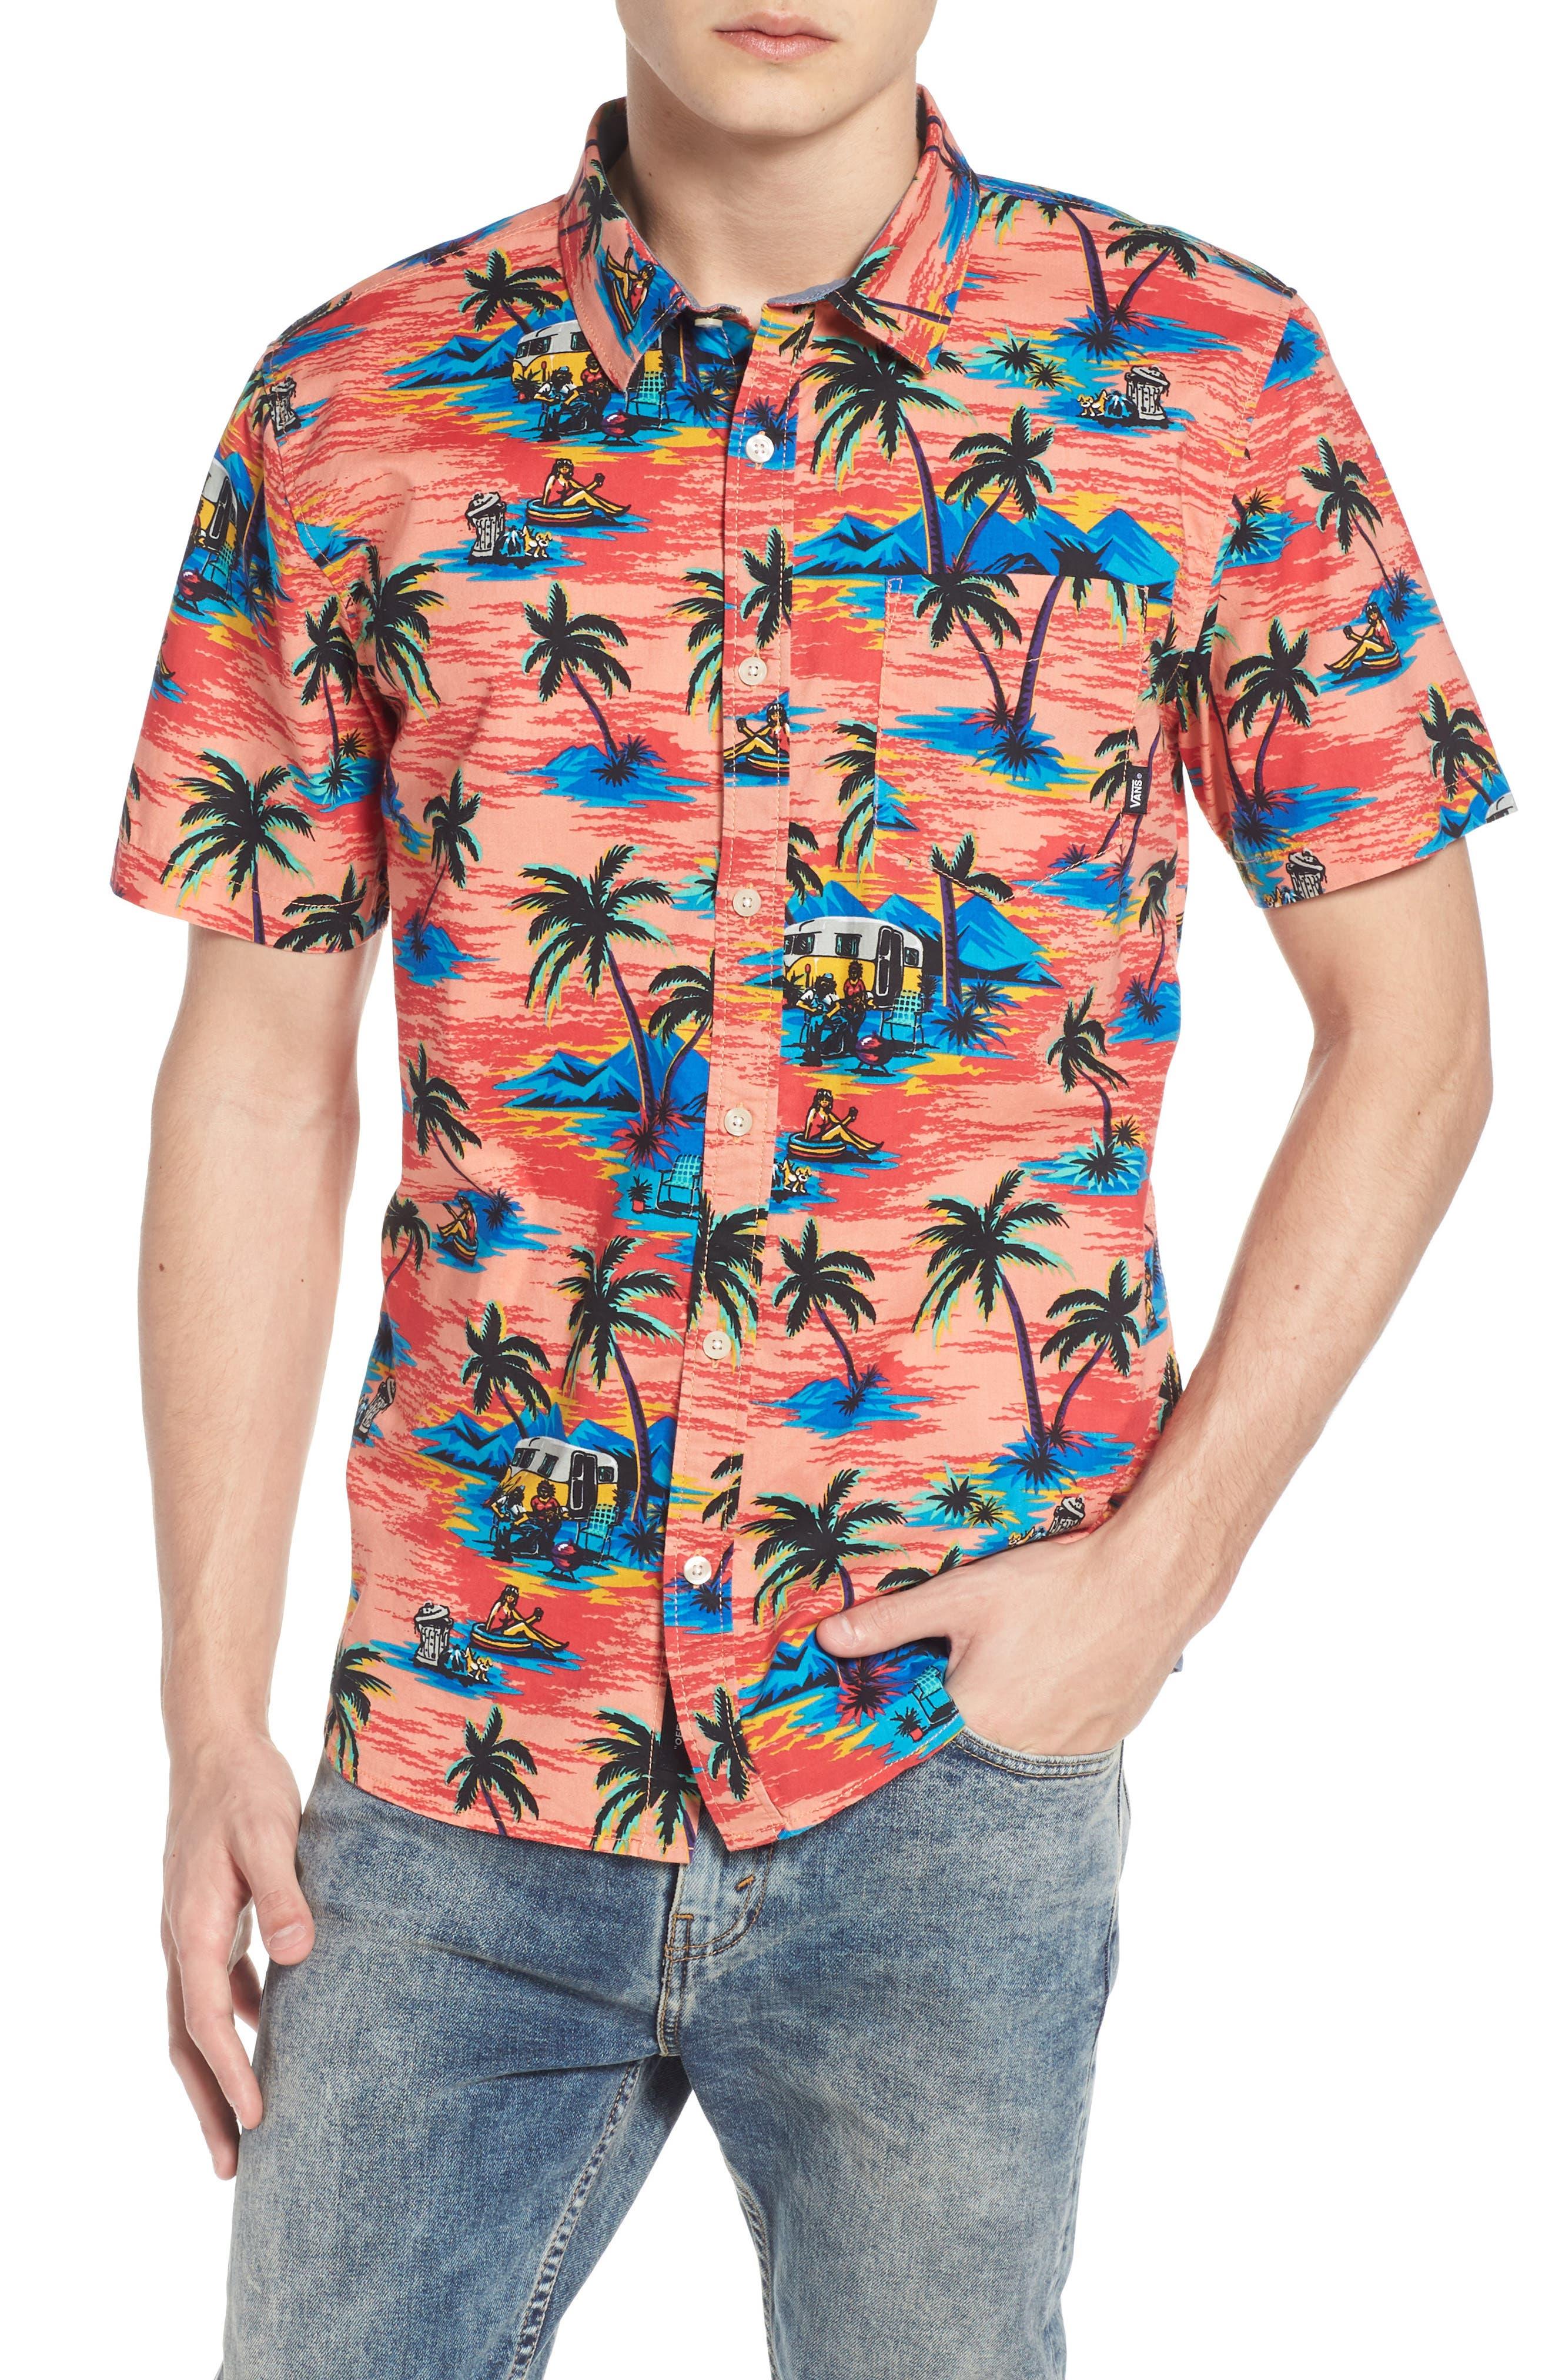 Vans Dystopia Woven Shirt